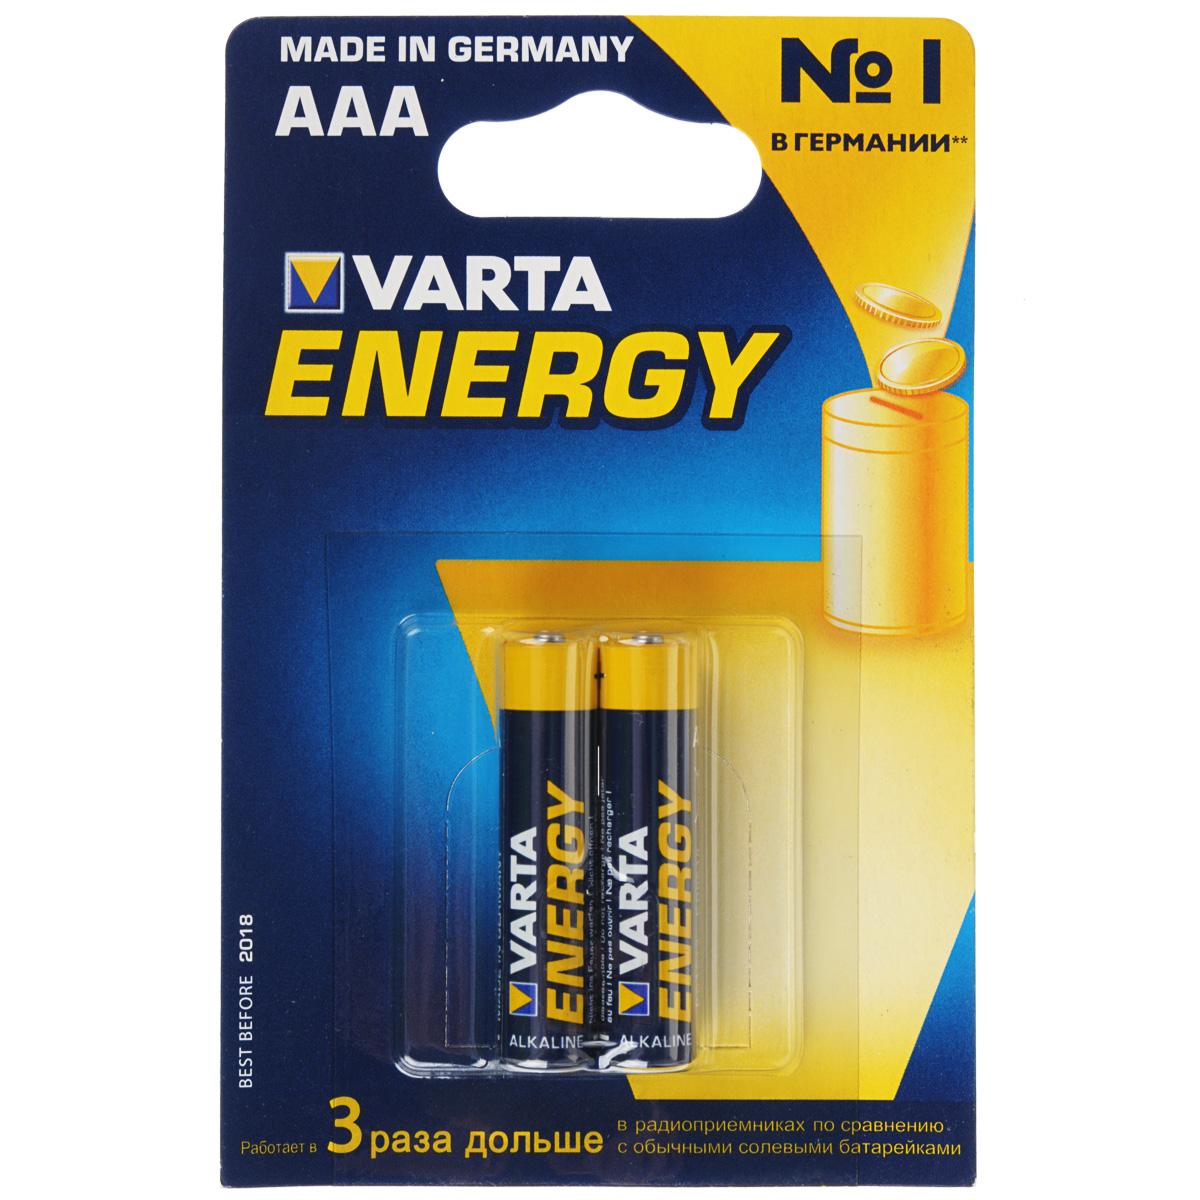 Батарейка Varta Energy, тип AAA, 1,5В, 2 шт energy